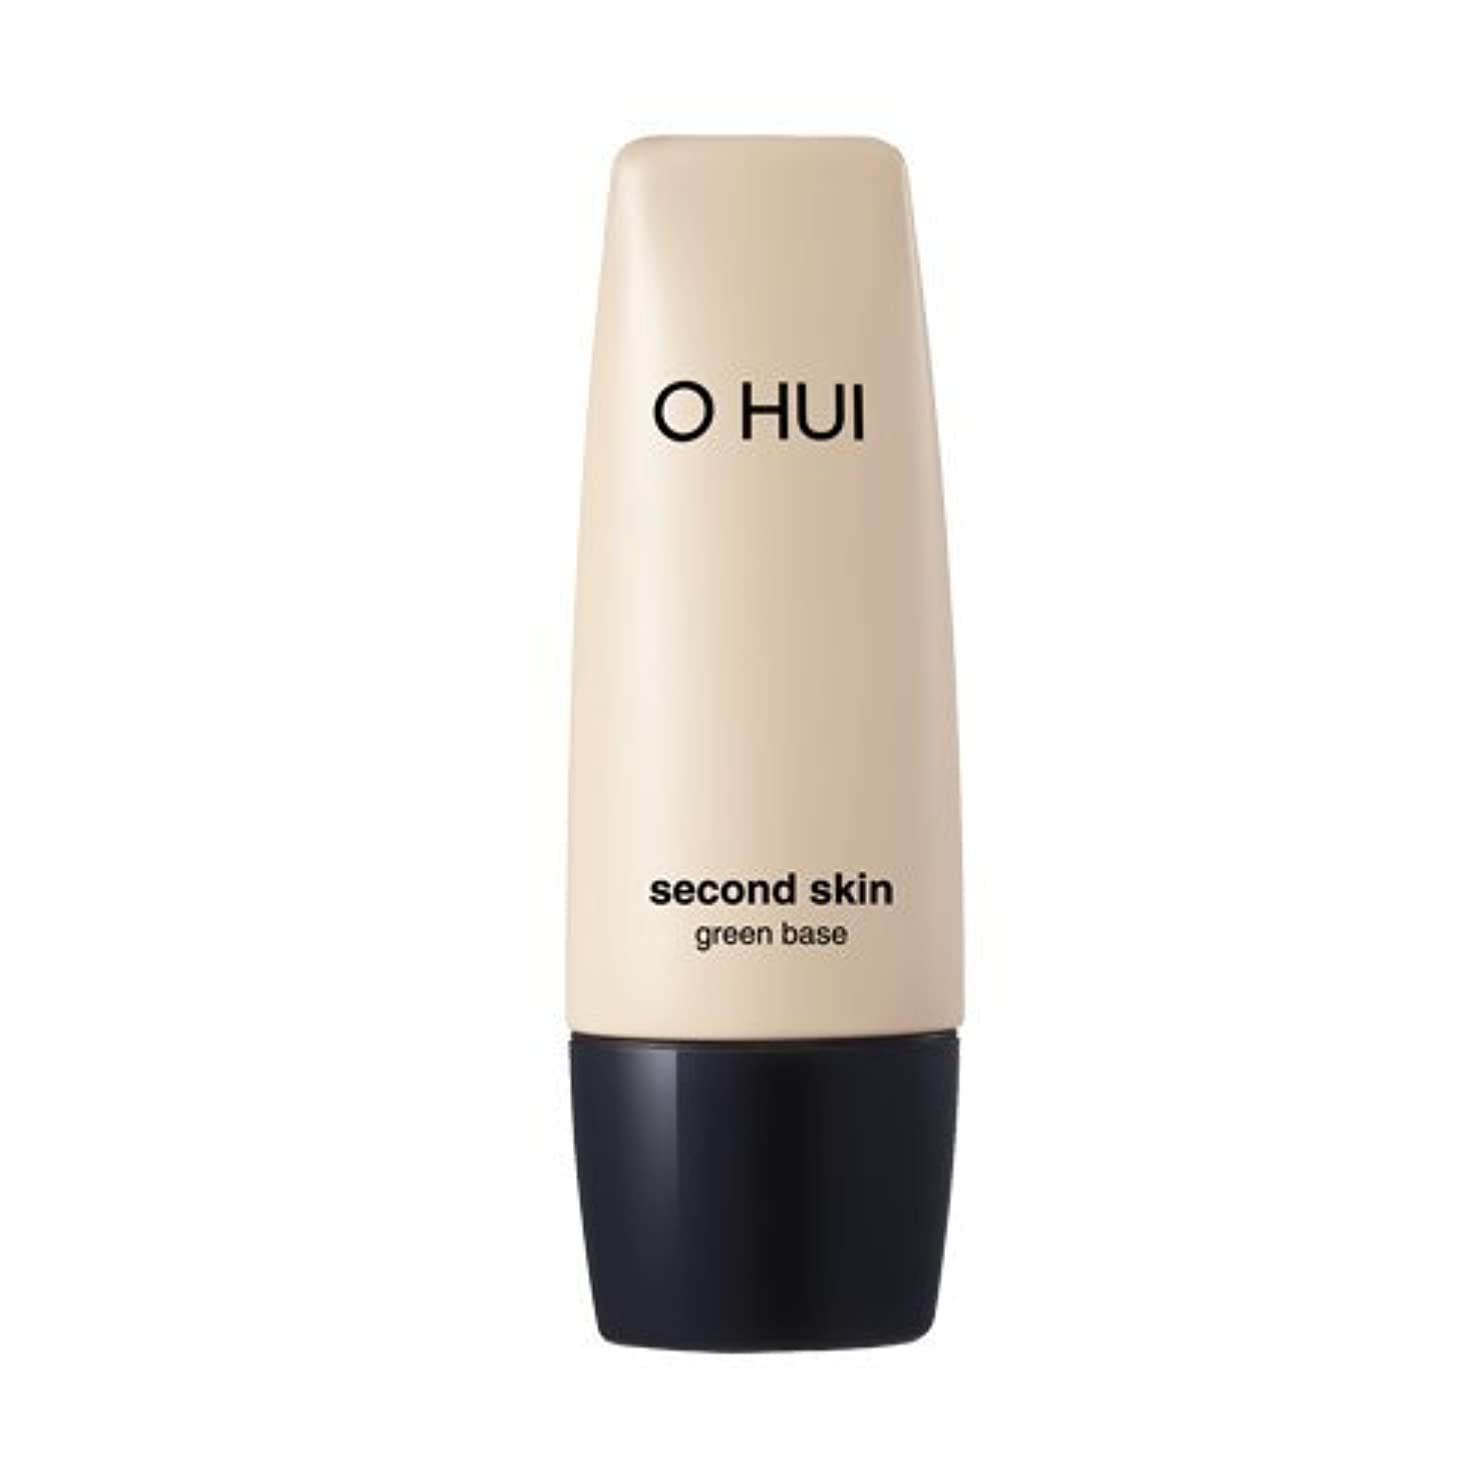 OHUI Second Skin Green Base 40ml/オフィ セカンド スキン グリーン ベース 40ml